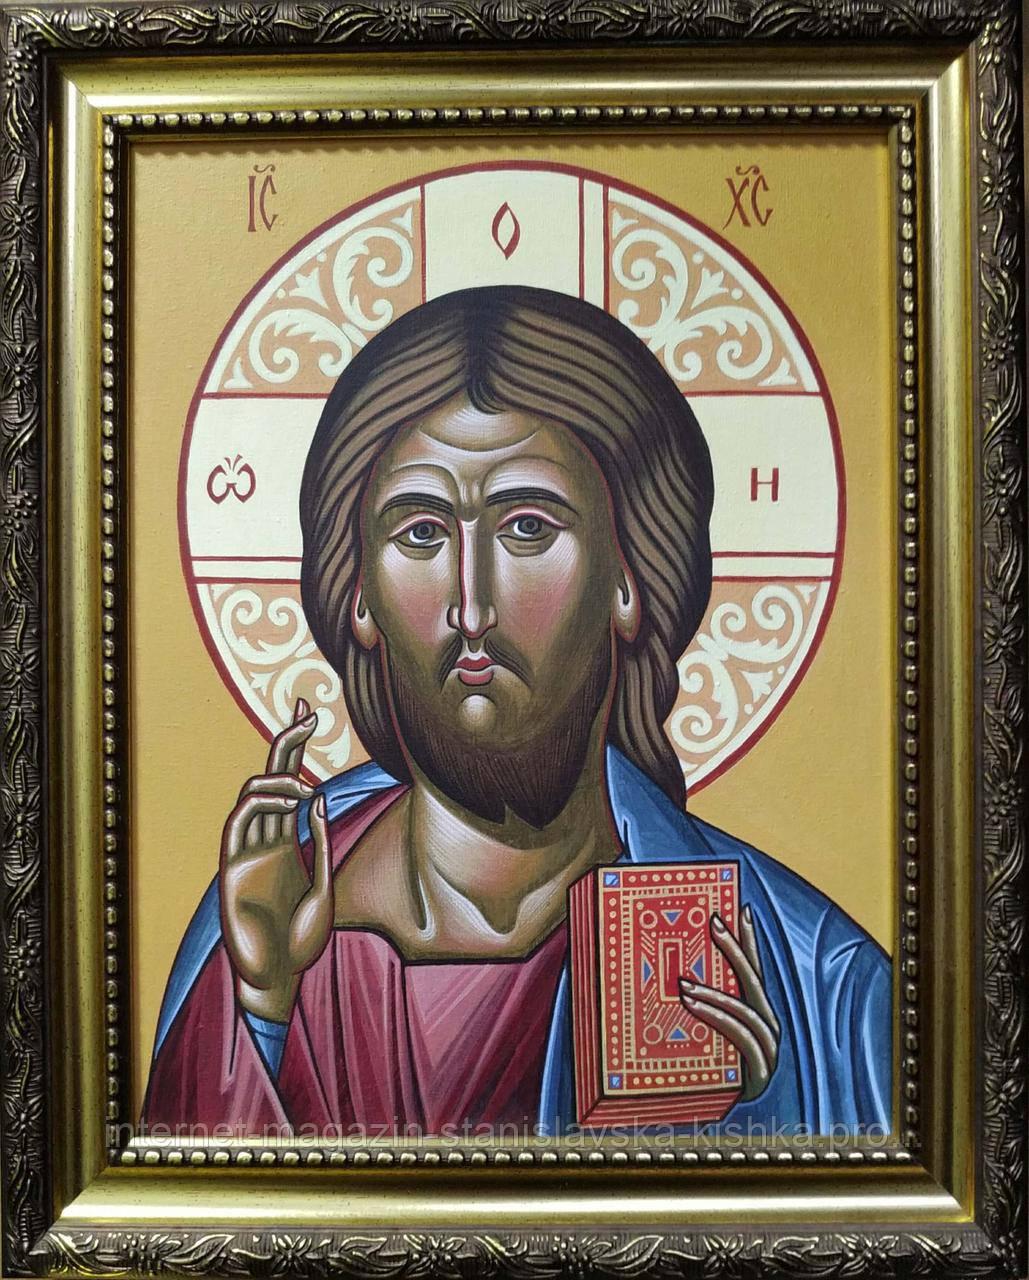 Живопис ІКОНА ХРИСТА ПАНТОКРАТОРА полотно акрил 30*24 в рамі